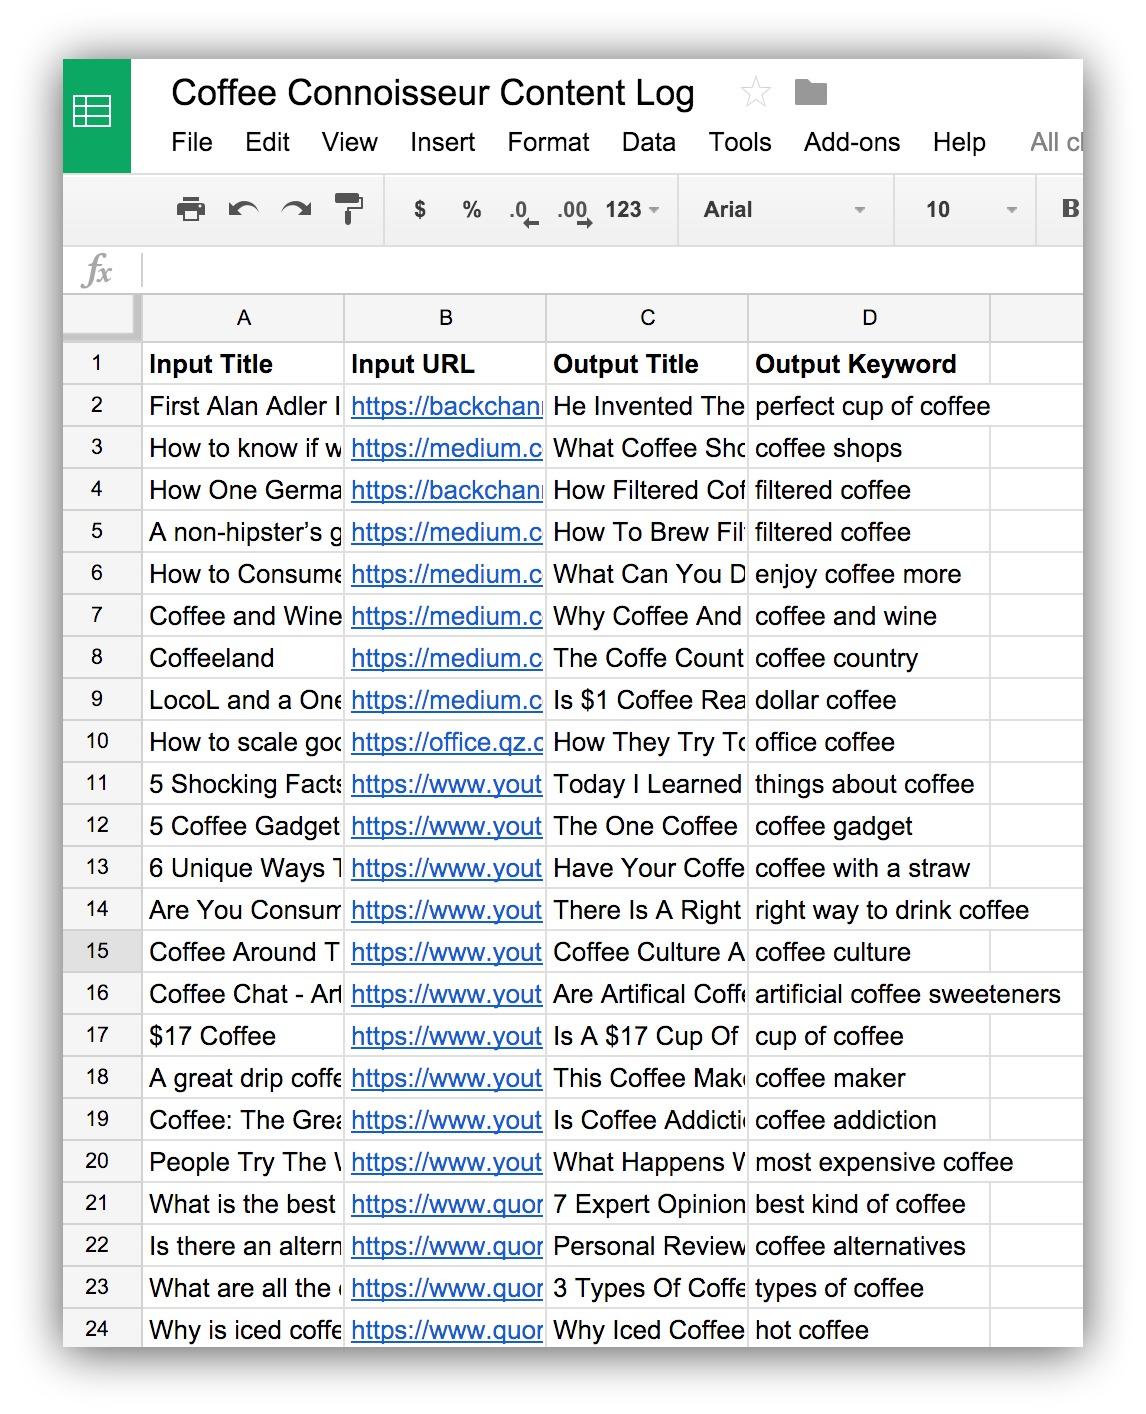 content log spreadsheet example